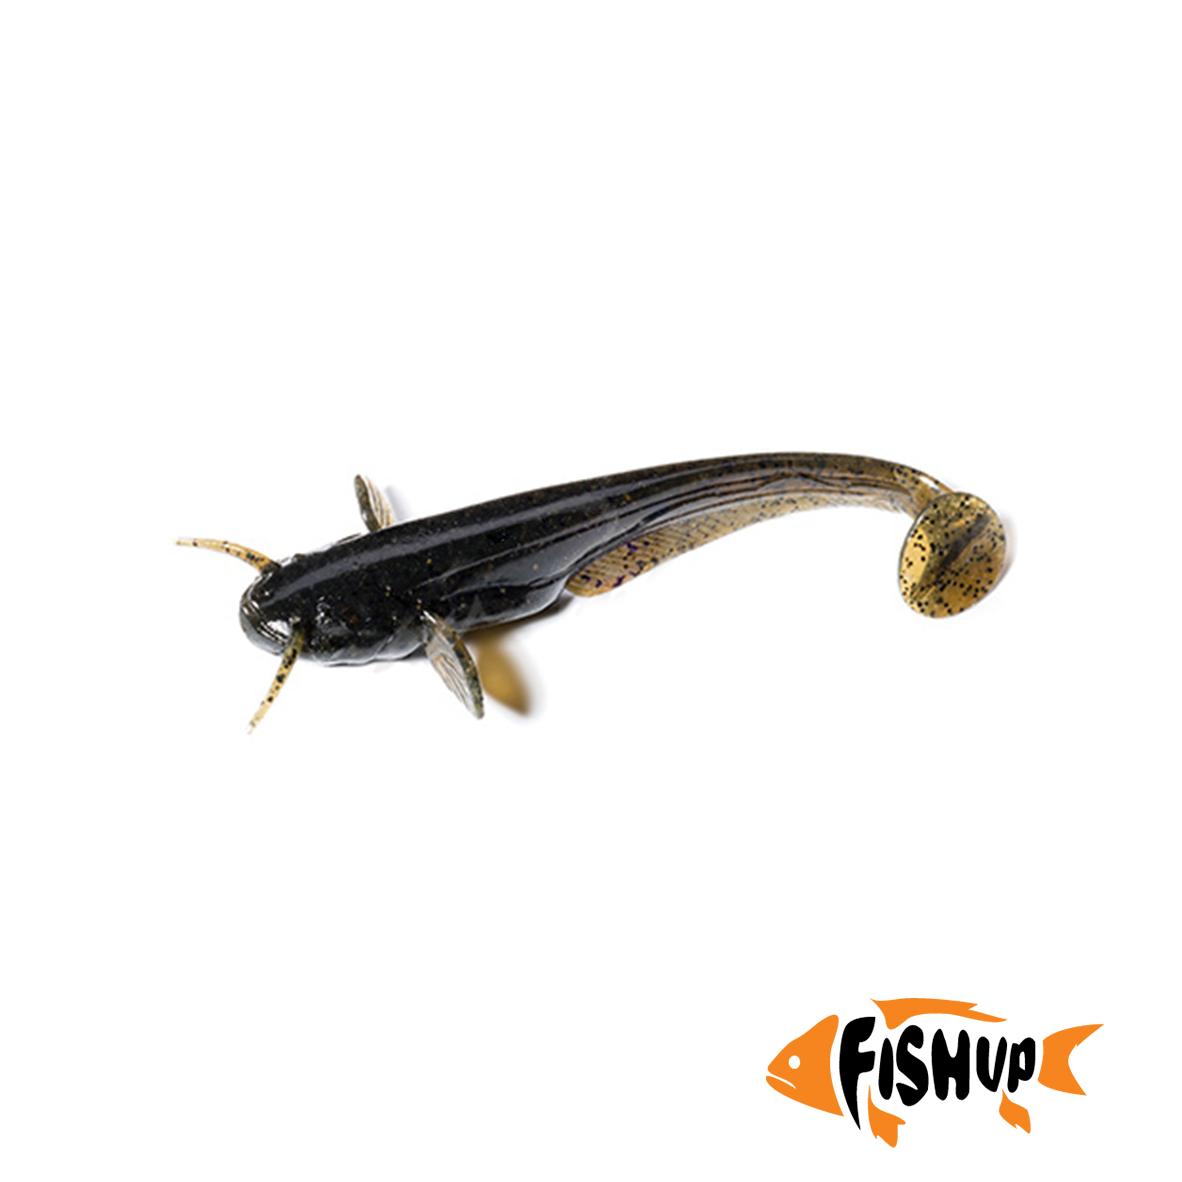 "Catfish 3"" (8шт), #043 - Watermelon Brown/Black"